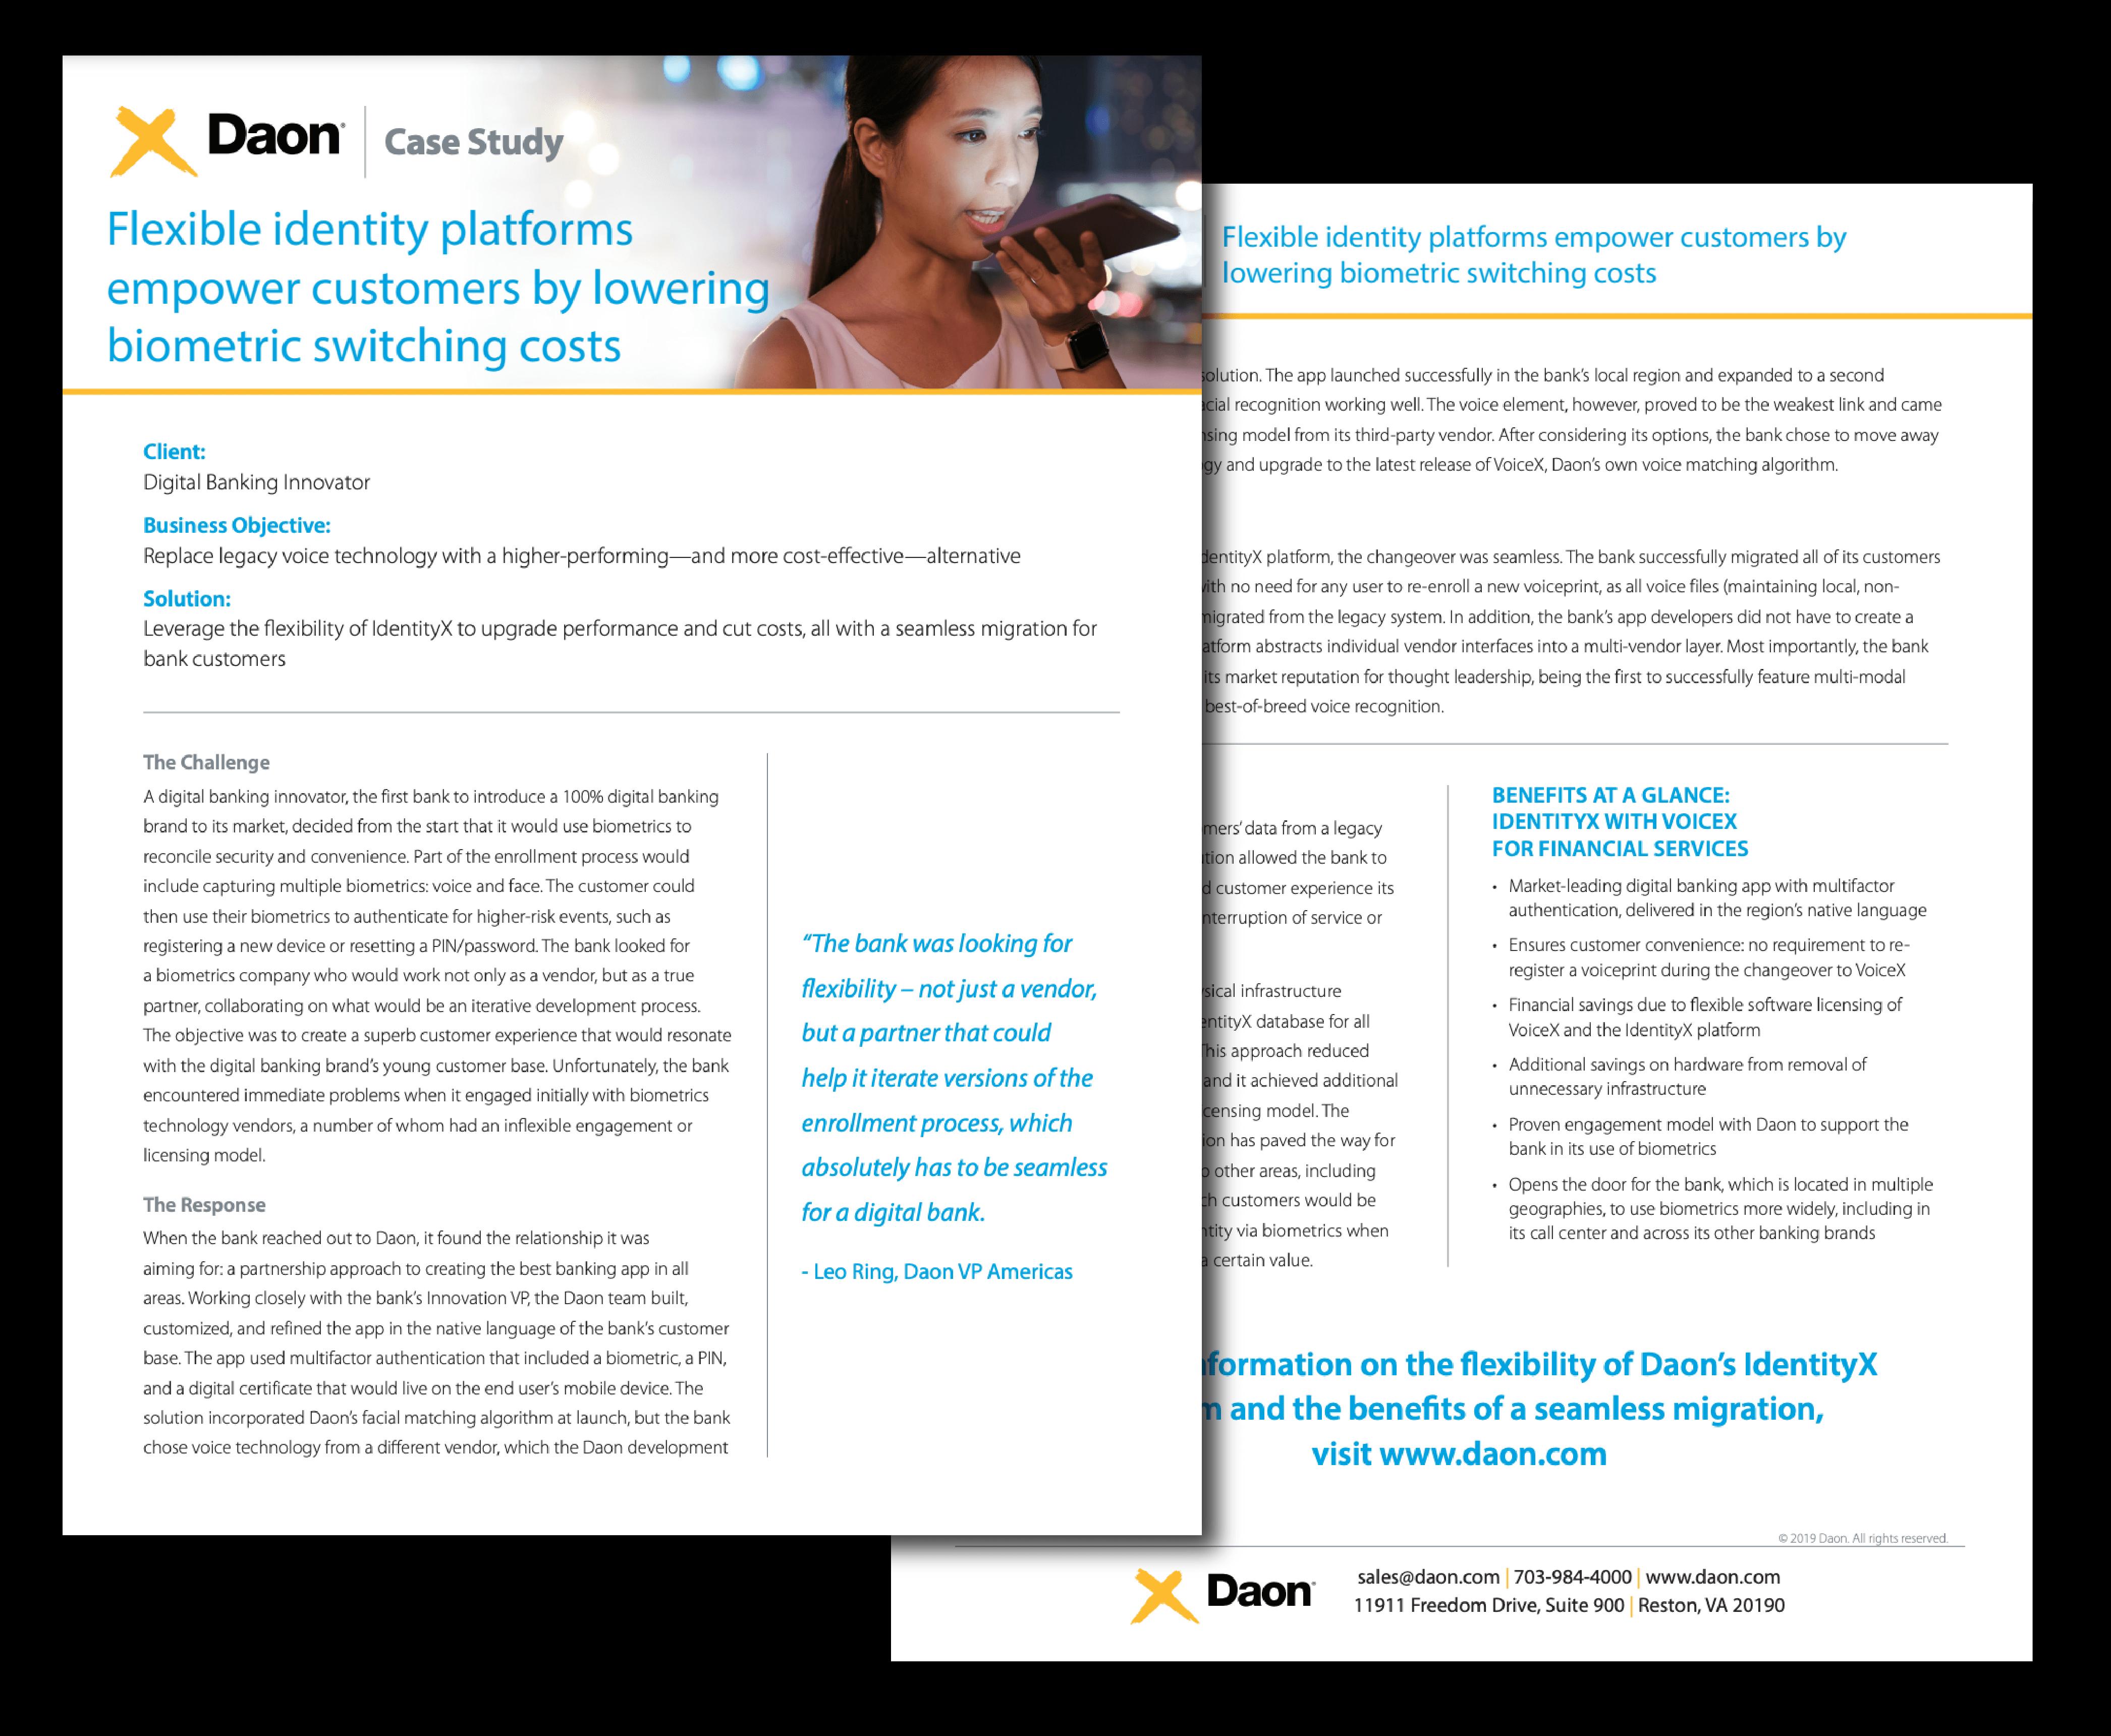 Case Study: Digital Banking Innovator